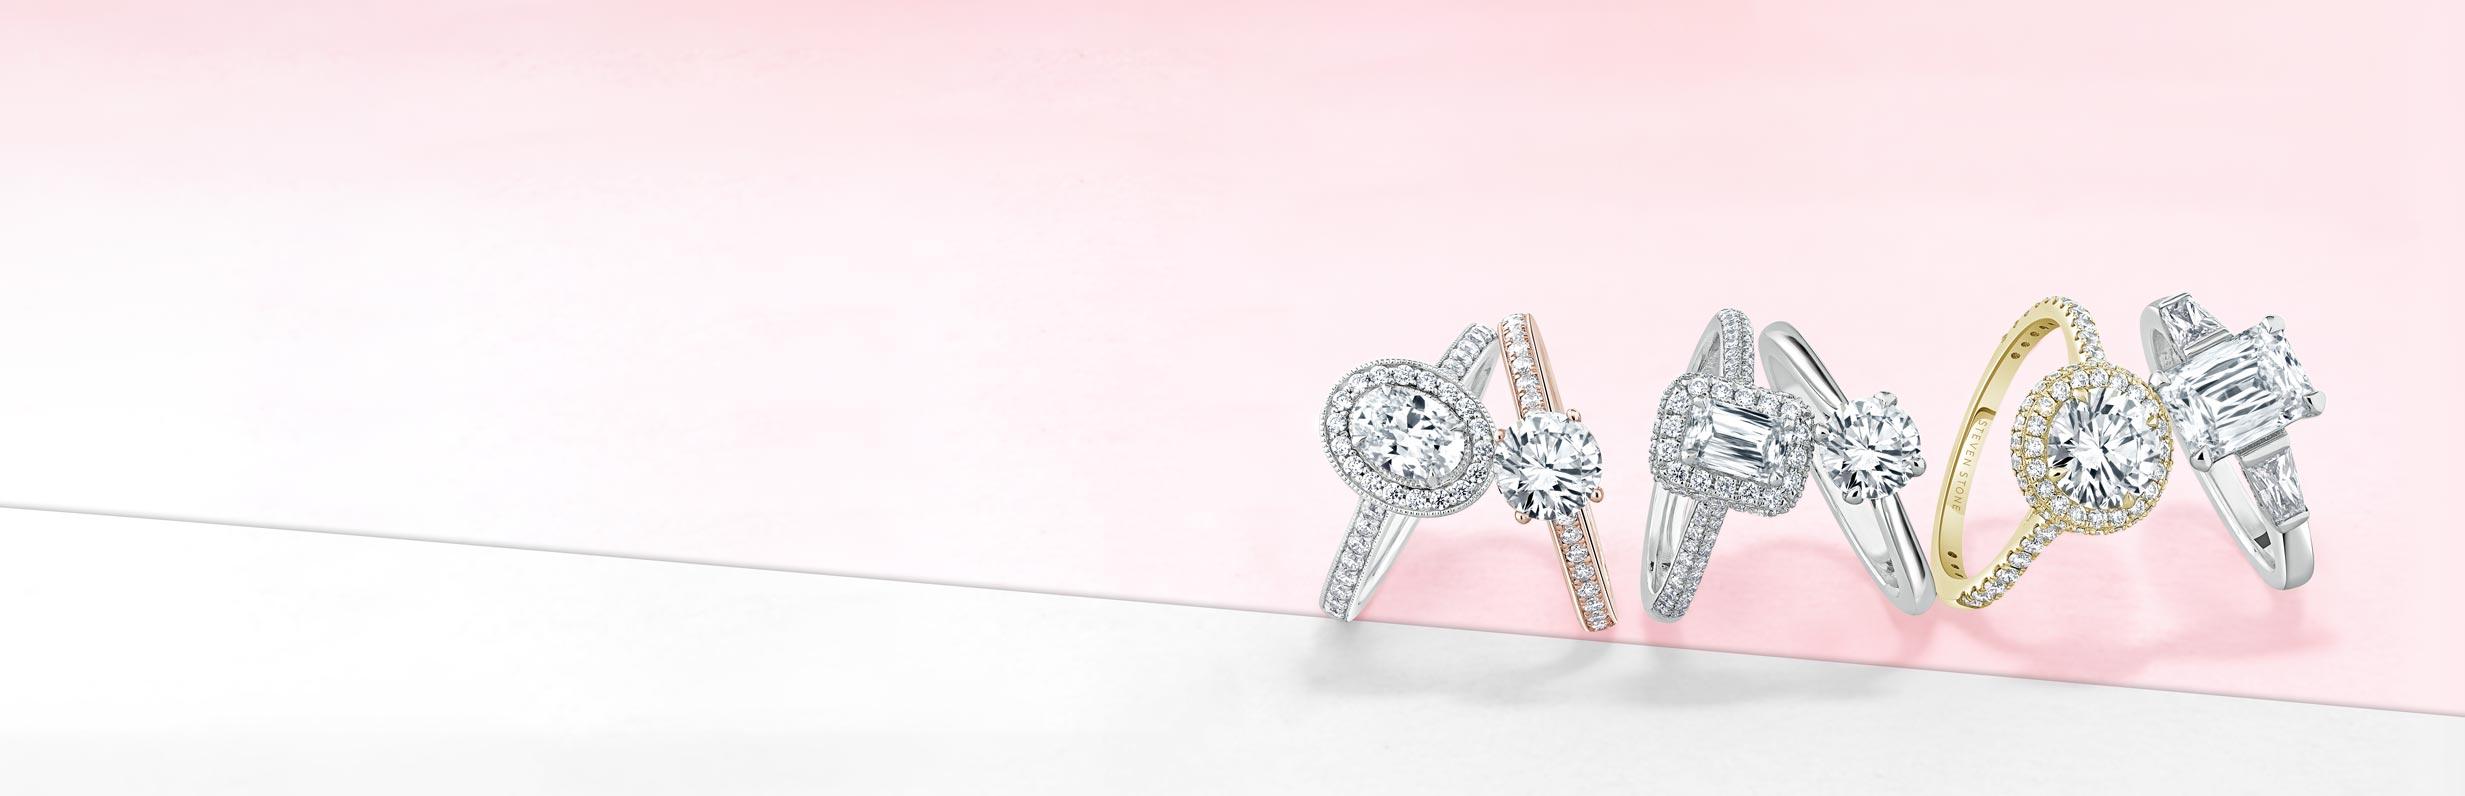 Radiant Cut Shoulder Set Engagement Rings - Steven Stone